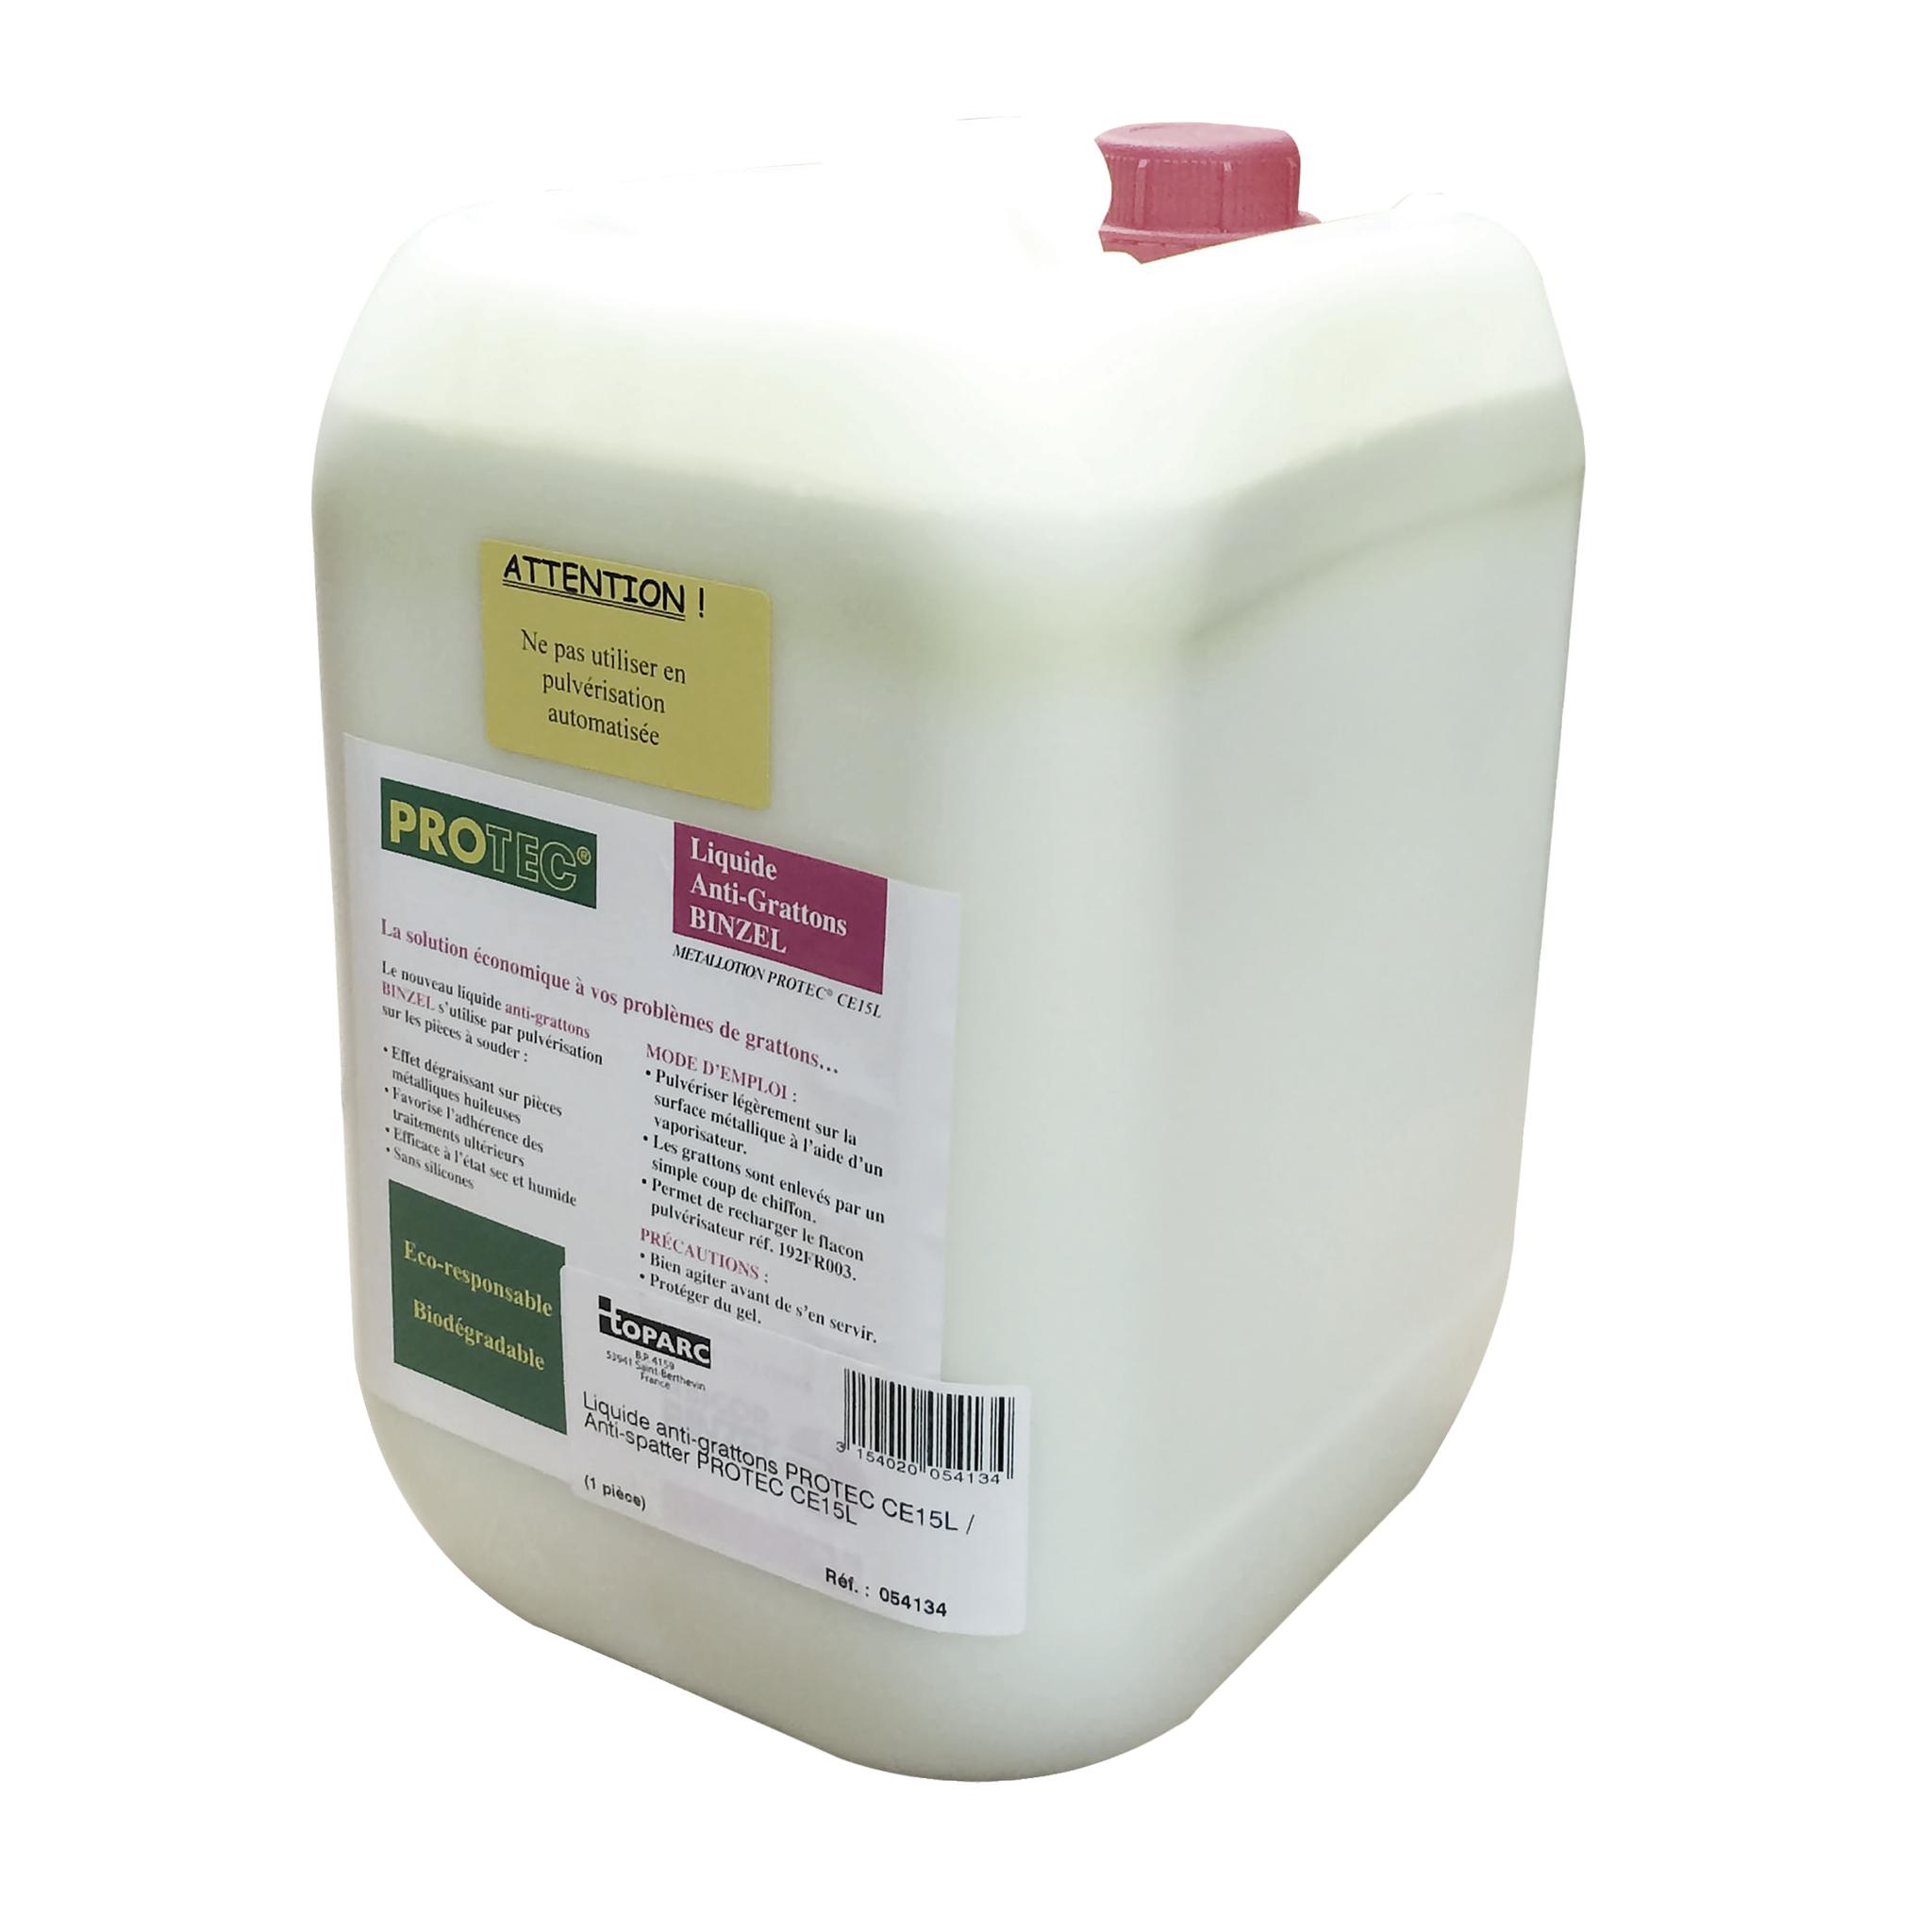 Liquide anti-grattons Protec 10l